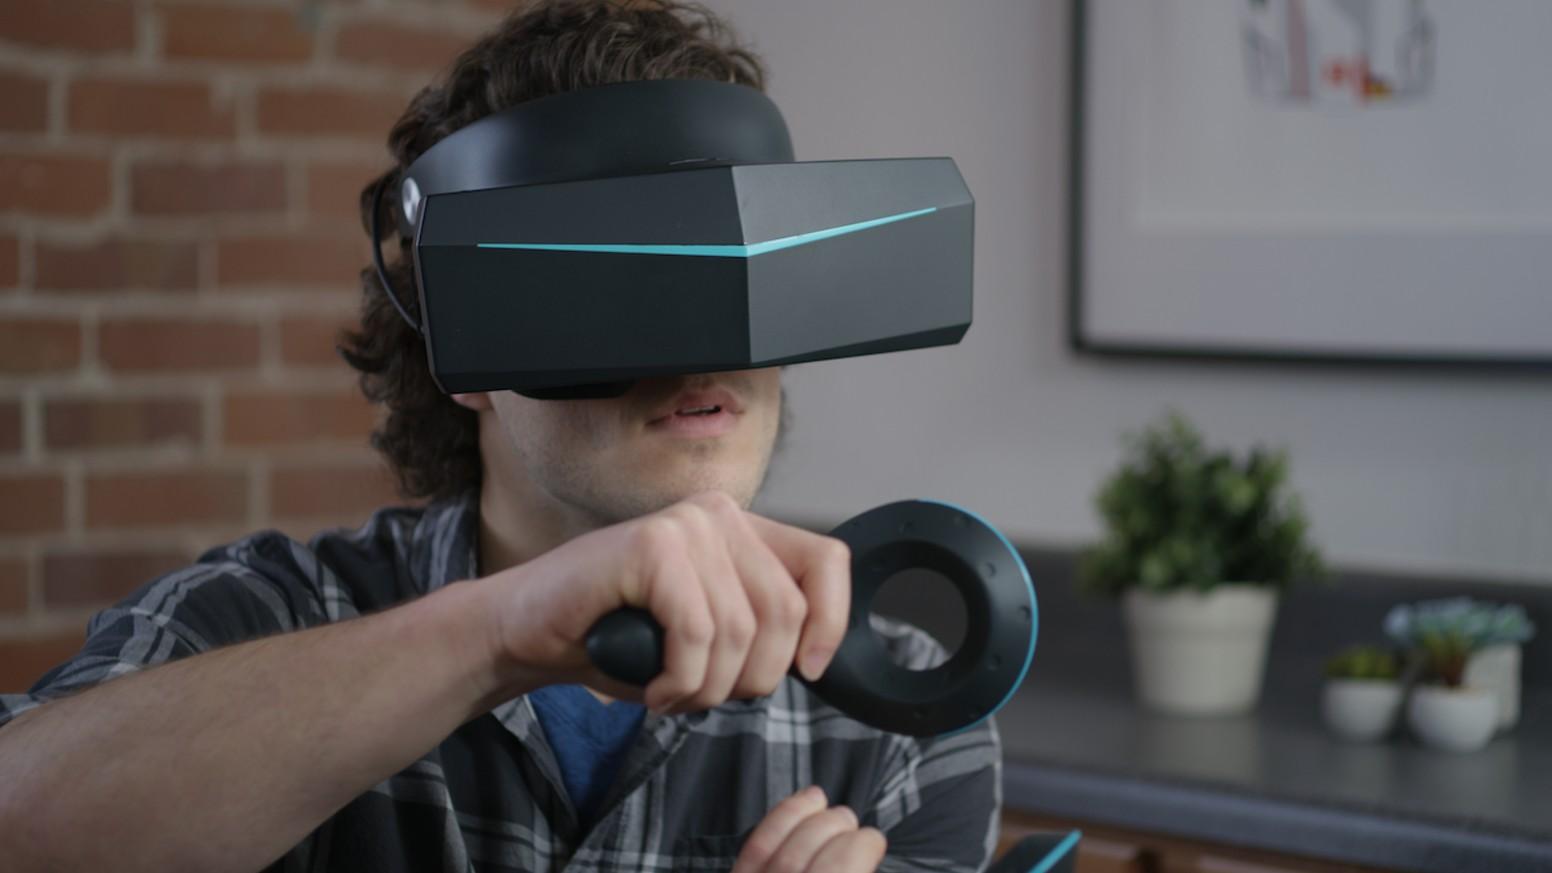 VR-очки с разрешением 8K от китайского стартапа Pimax